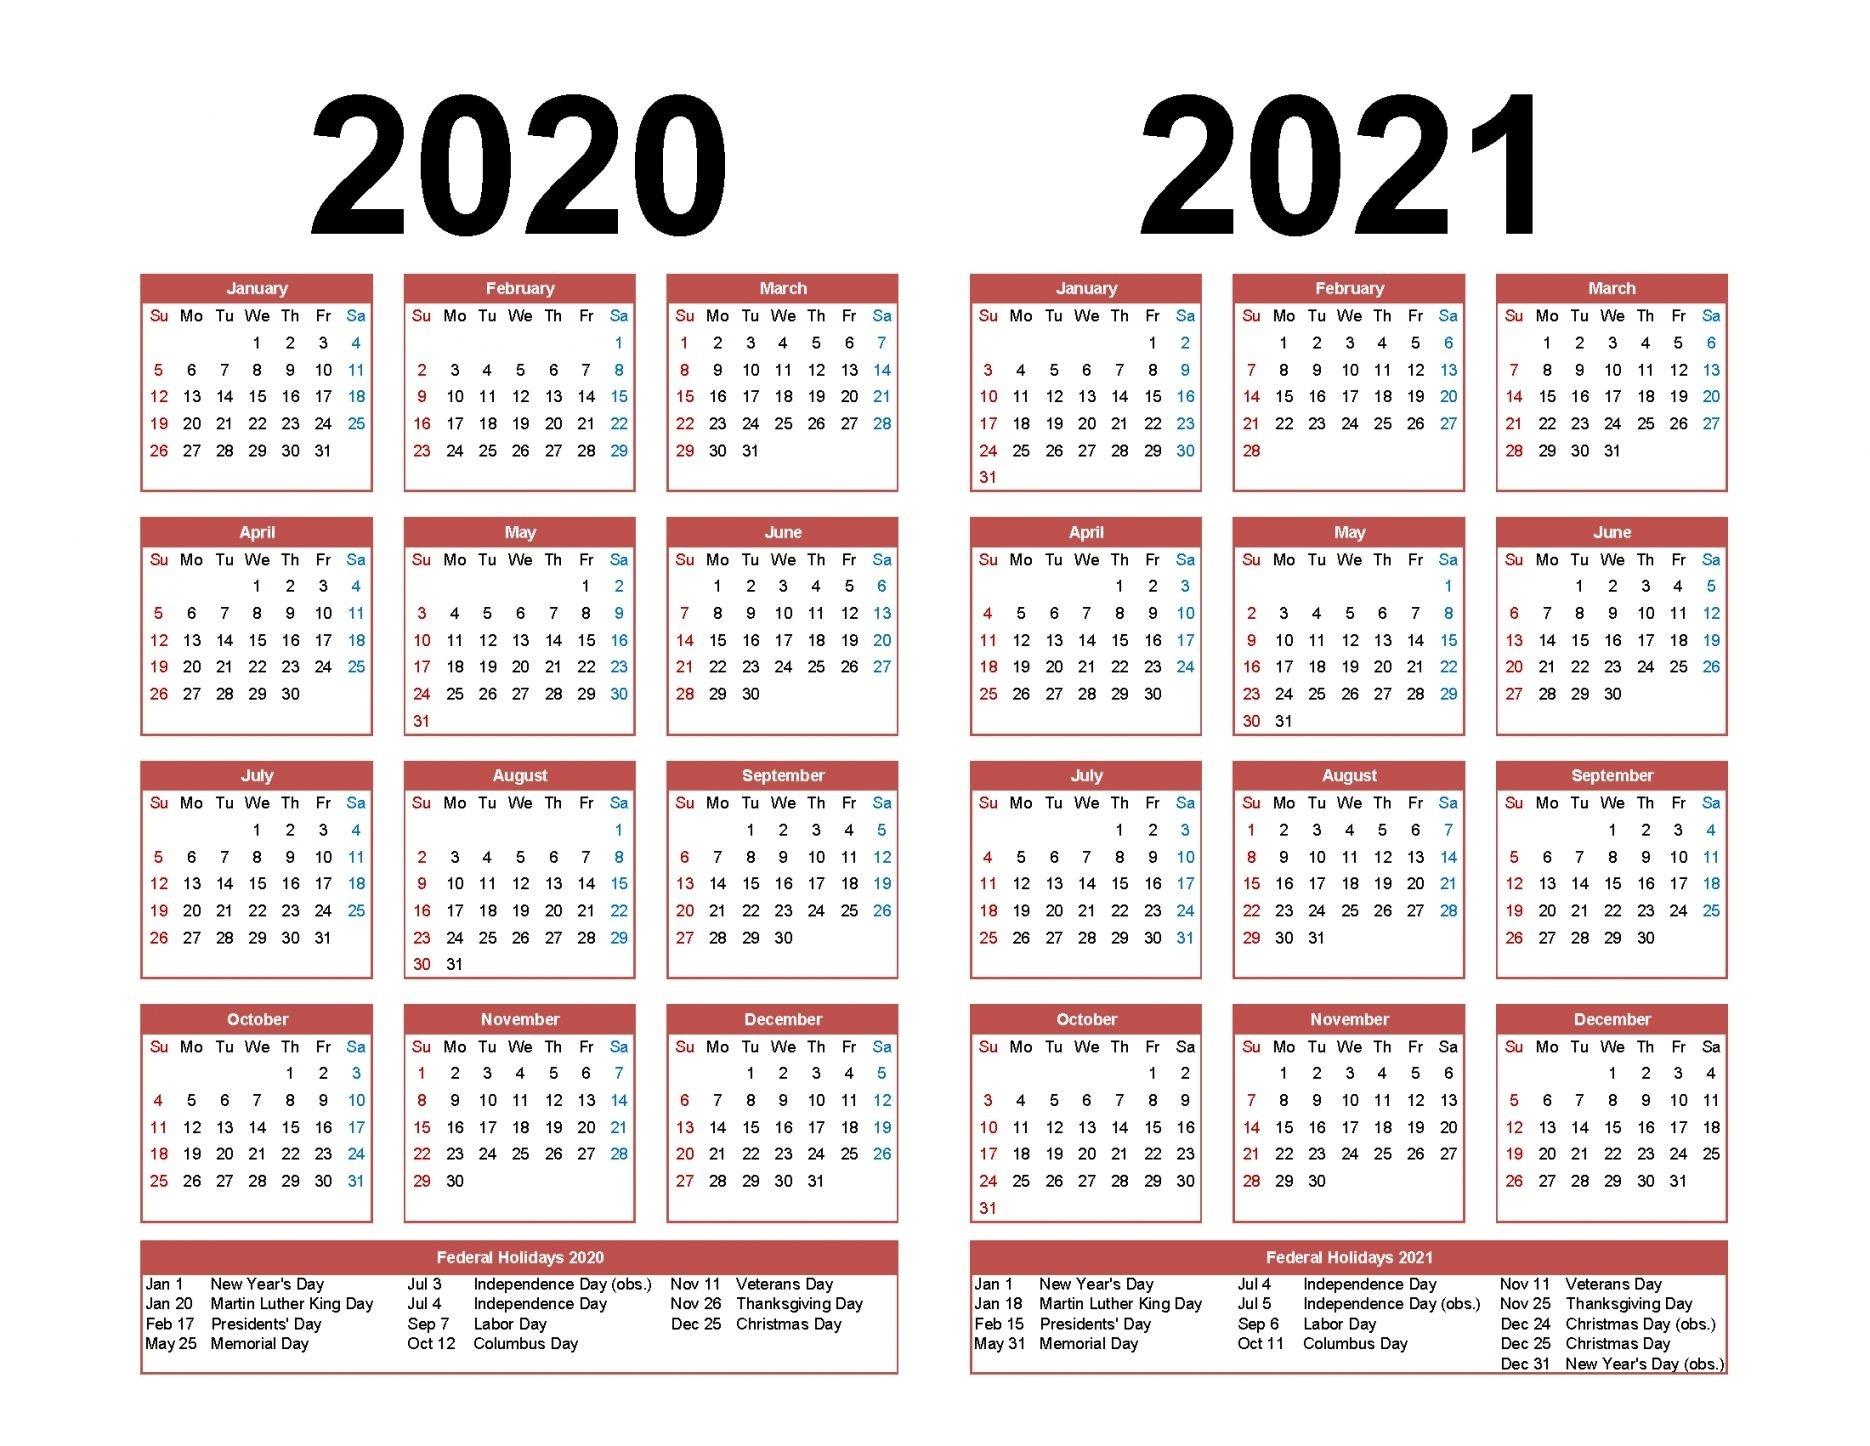 2021 Calendar Printable One Page Di 2020  2021 Julian Date Code Calendar